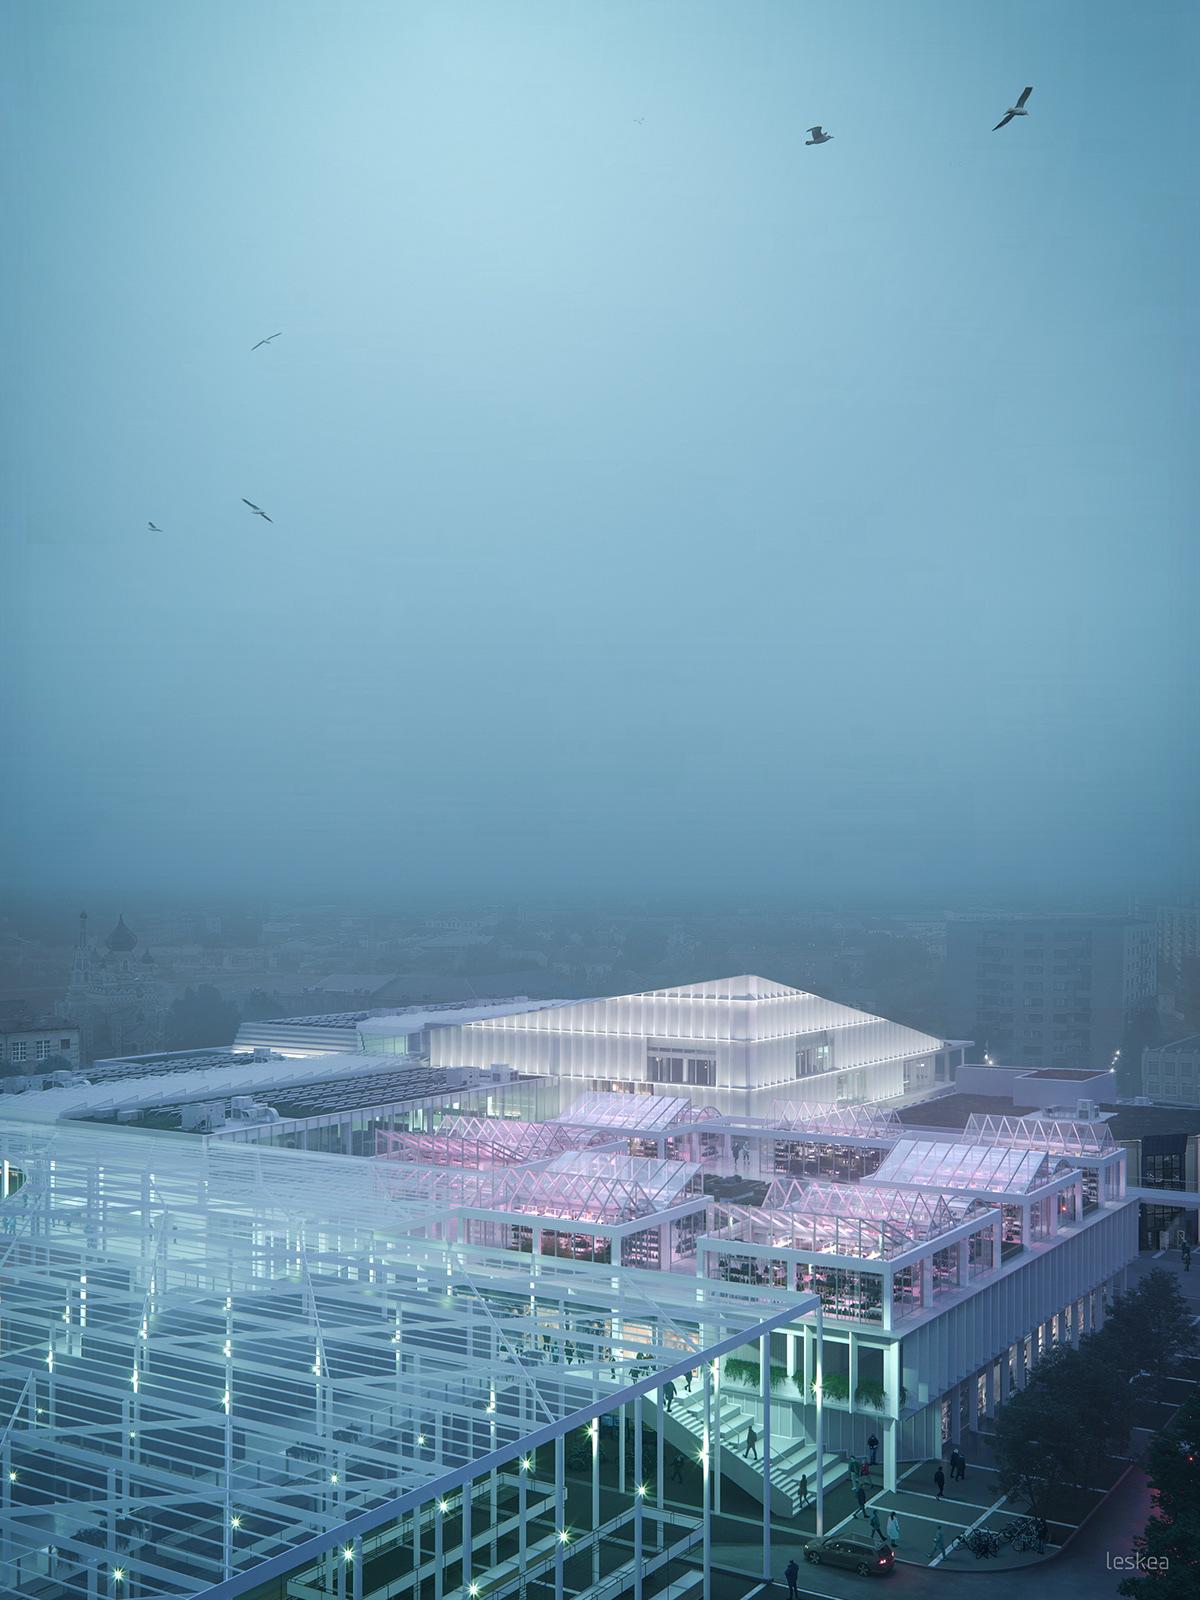 architecture leskea visualisation